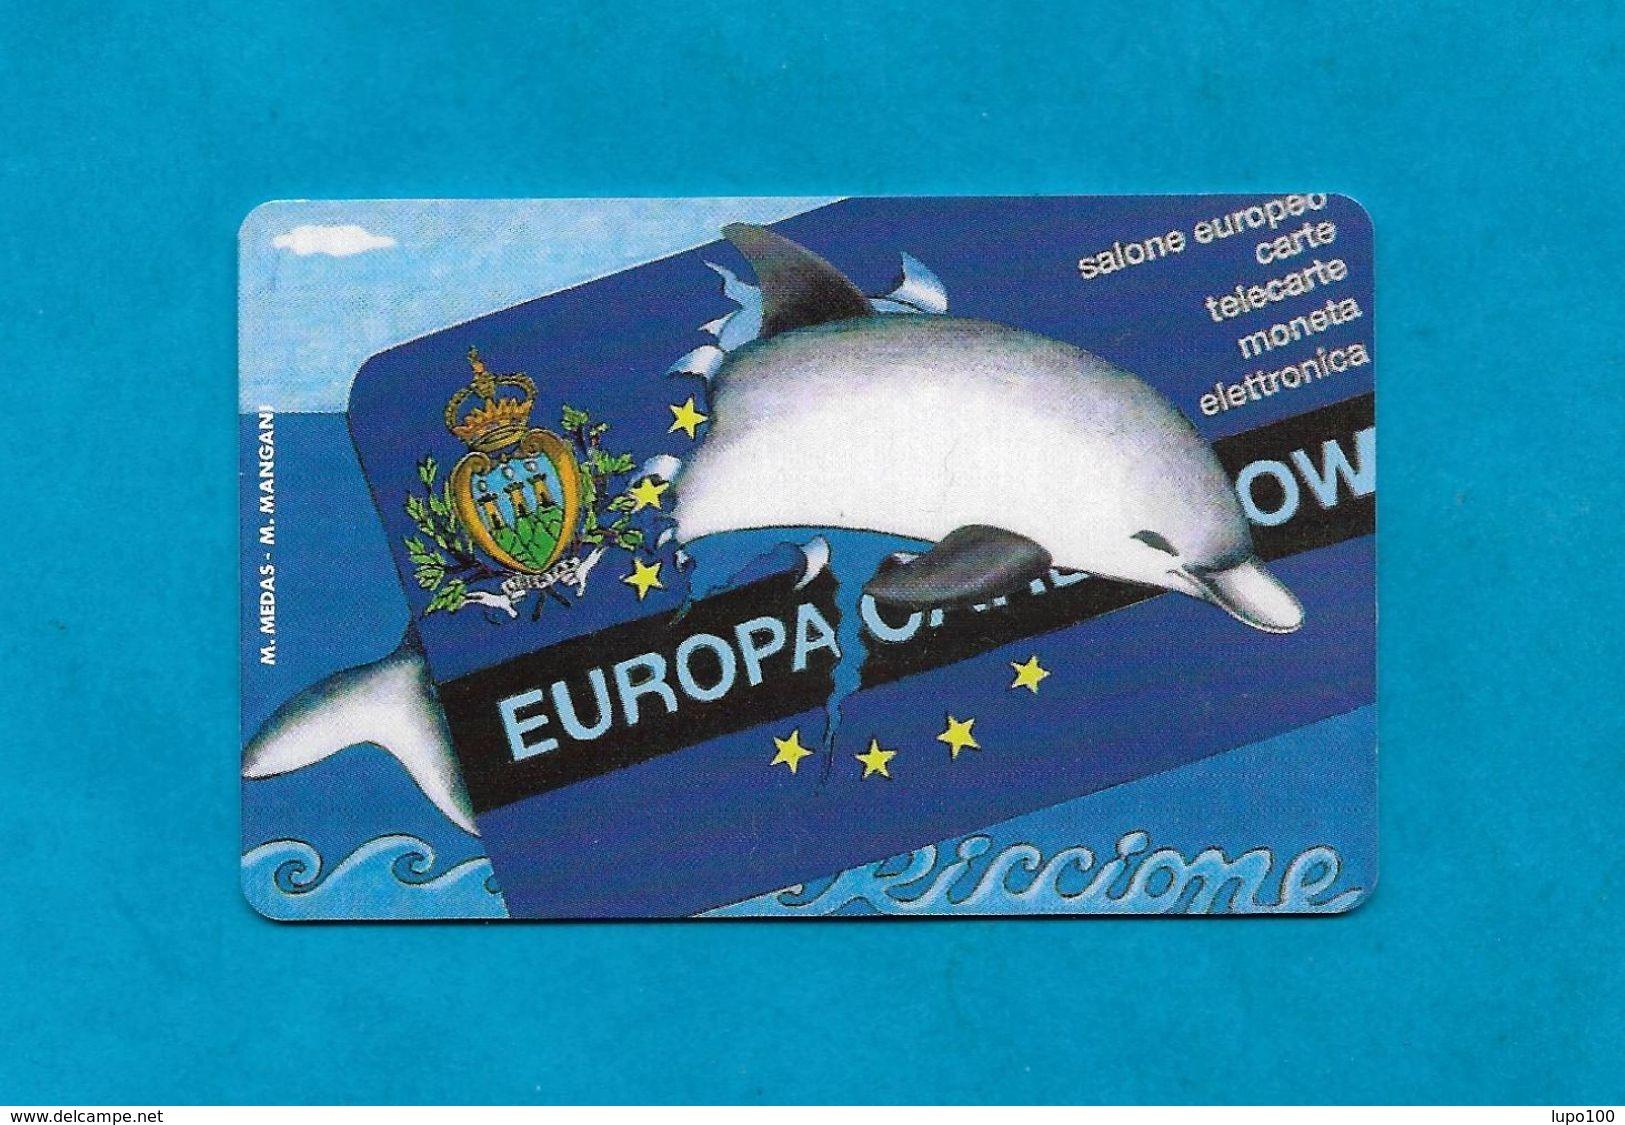 SAN MARINO SCHEDA TELEFONICA NUOVA NEW PHONECARD 30 - EUROPA CARD SHOW 98 DELFINO - San Marino